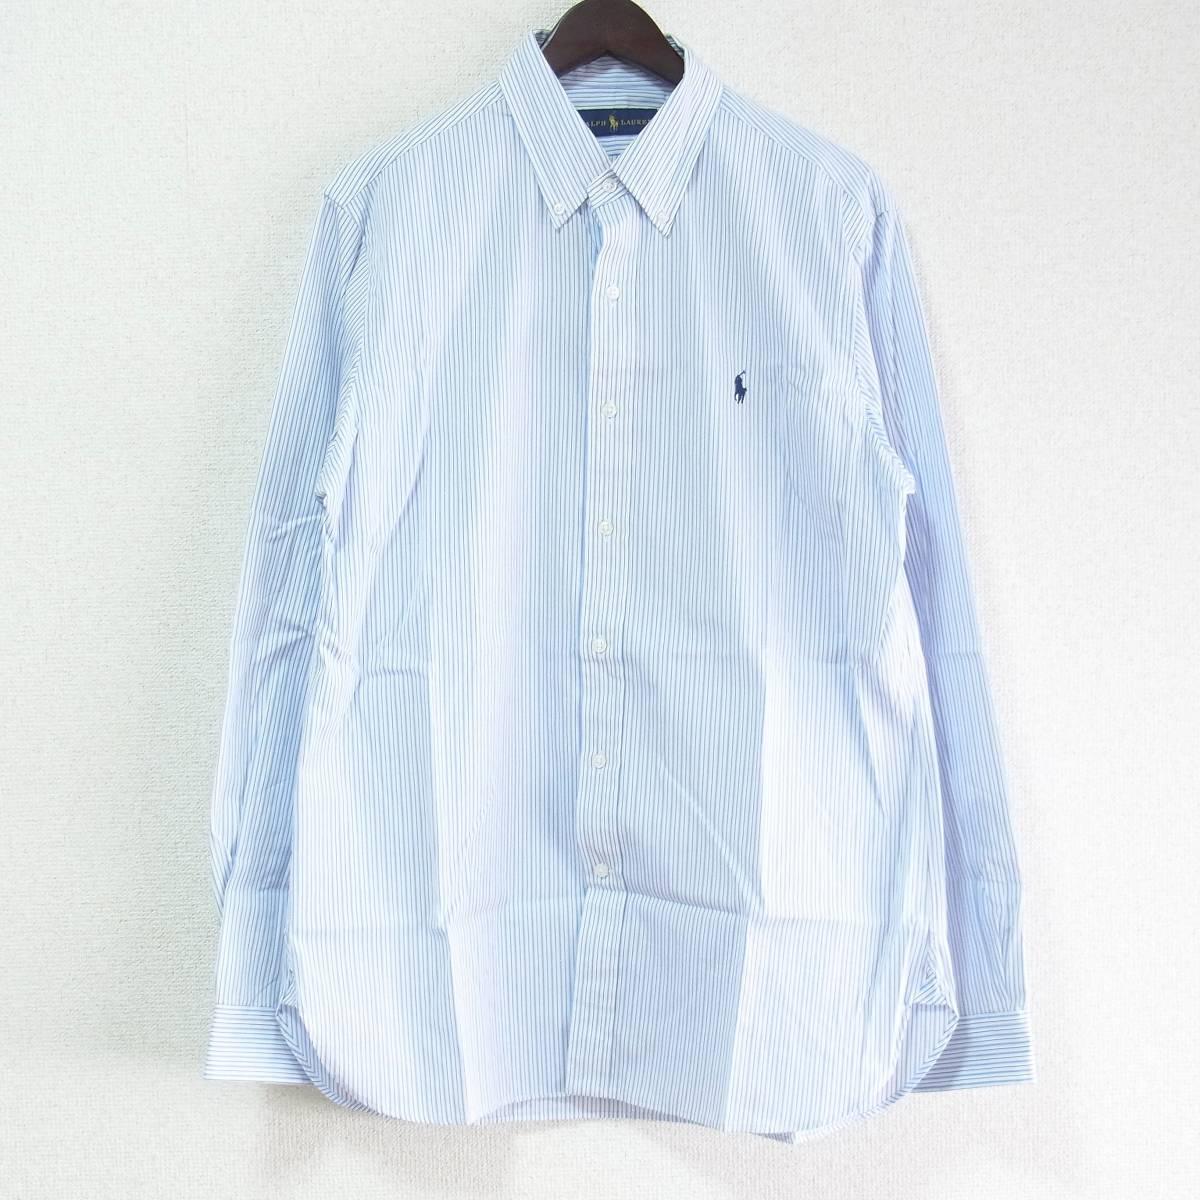 RALPH LAUREN ラルフローレン 長袖 ストライプ ボタンダウンシャツ 15-1/2(39) ライトブルー/ネイビー